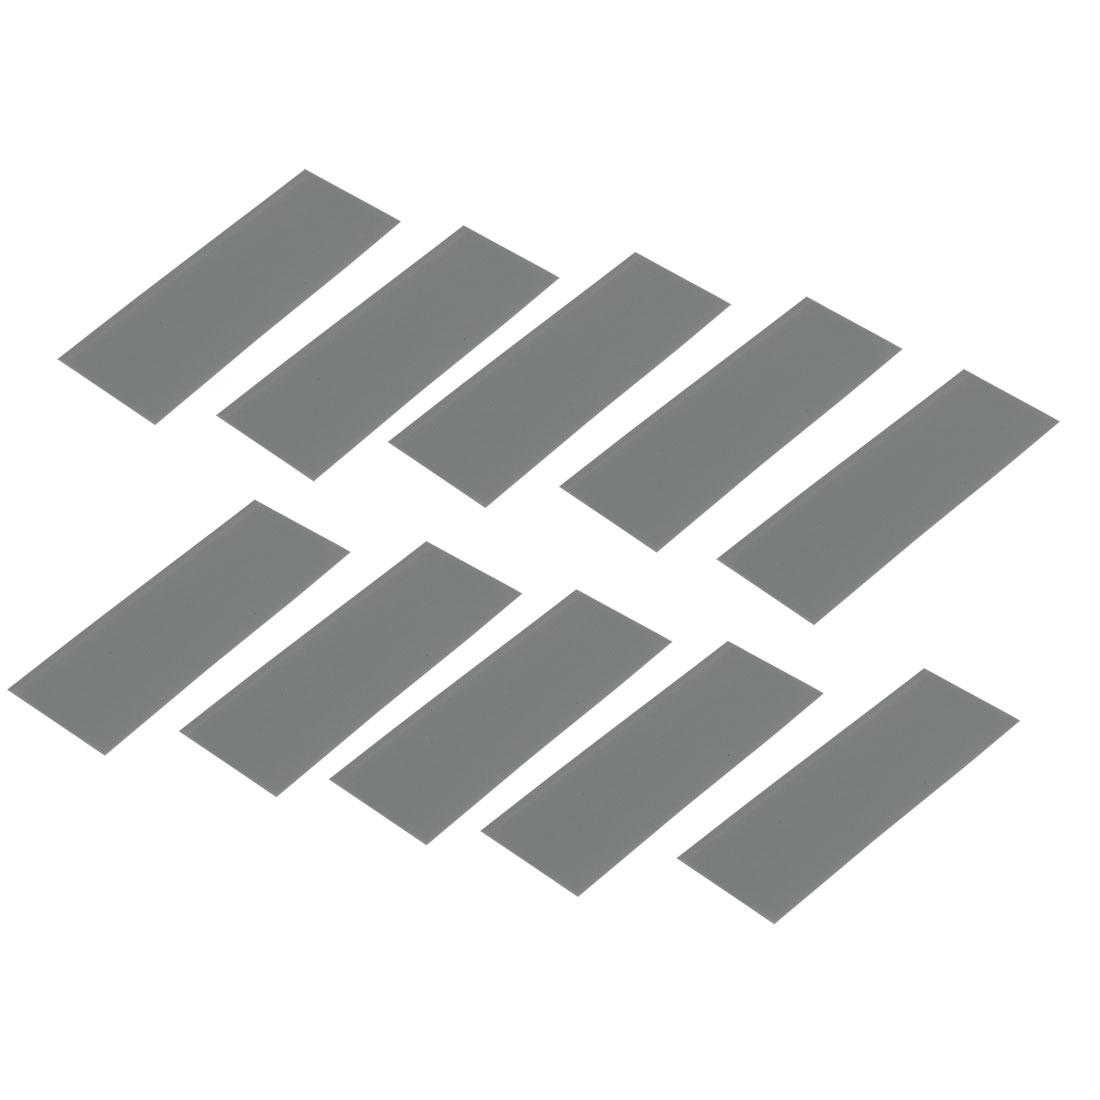 10pcs 17mm Flat Width 46mm Length PVC Heat Shrinkable Tube Gray for AAA Battery